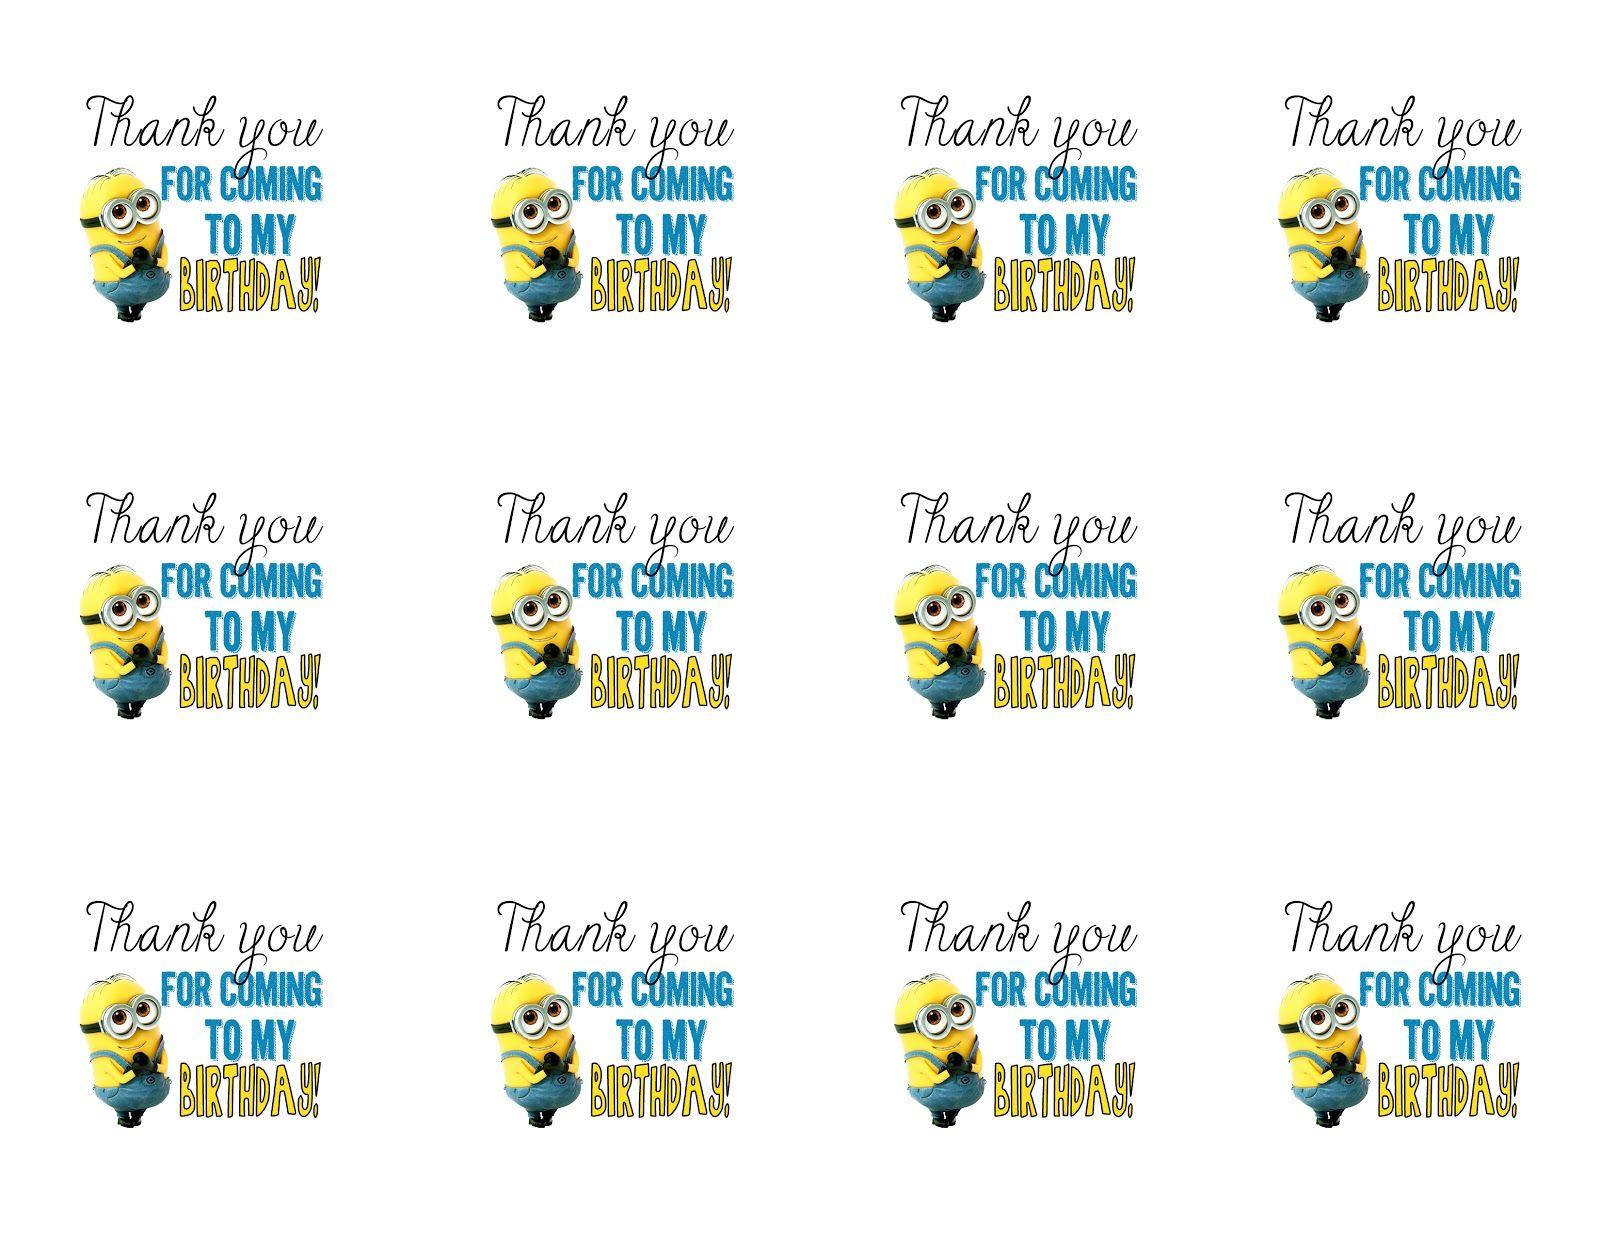 Diy Design Den Minion Birthday Party With Free Printables Minion Birthday Party Minion Birthday Minion Party